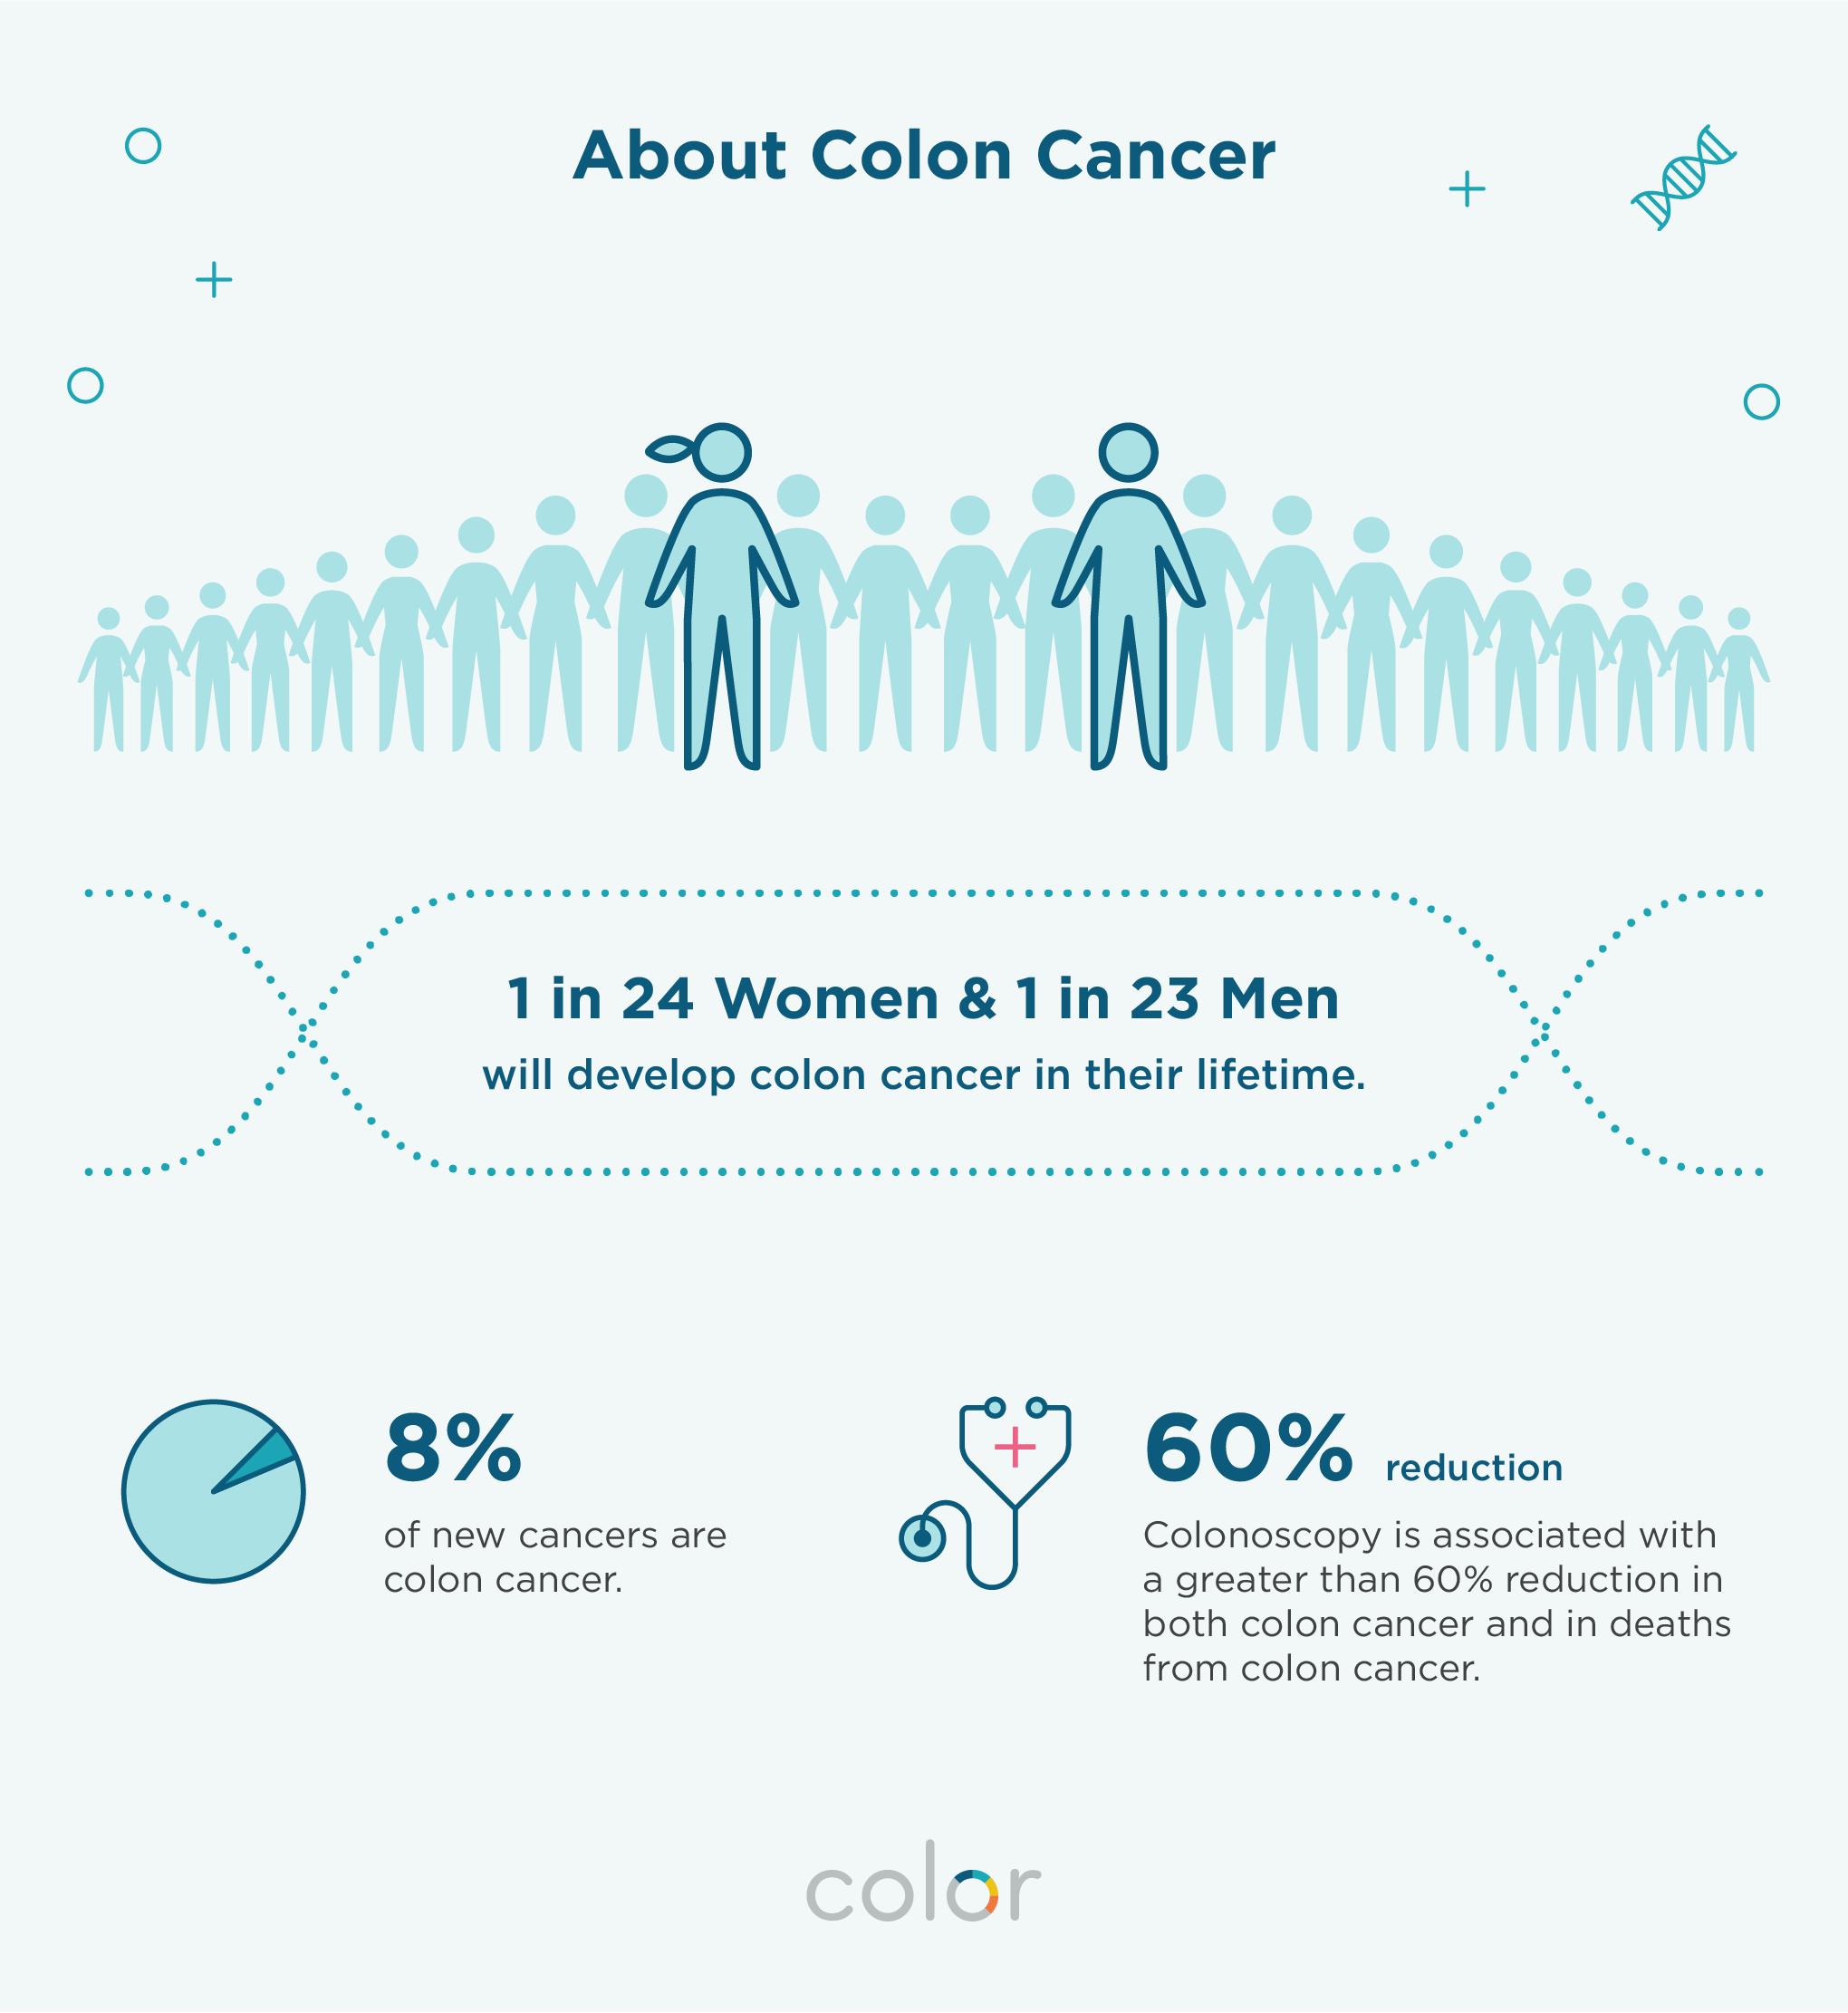 endometrial cancer in premenopausal cancer colon flatulence